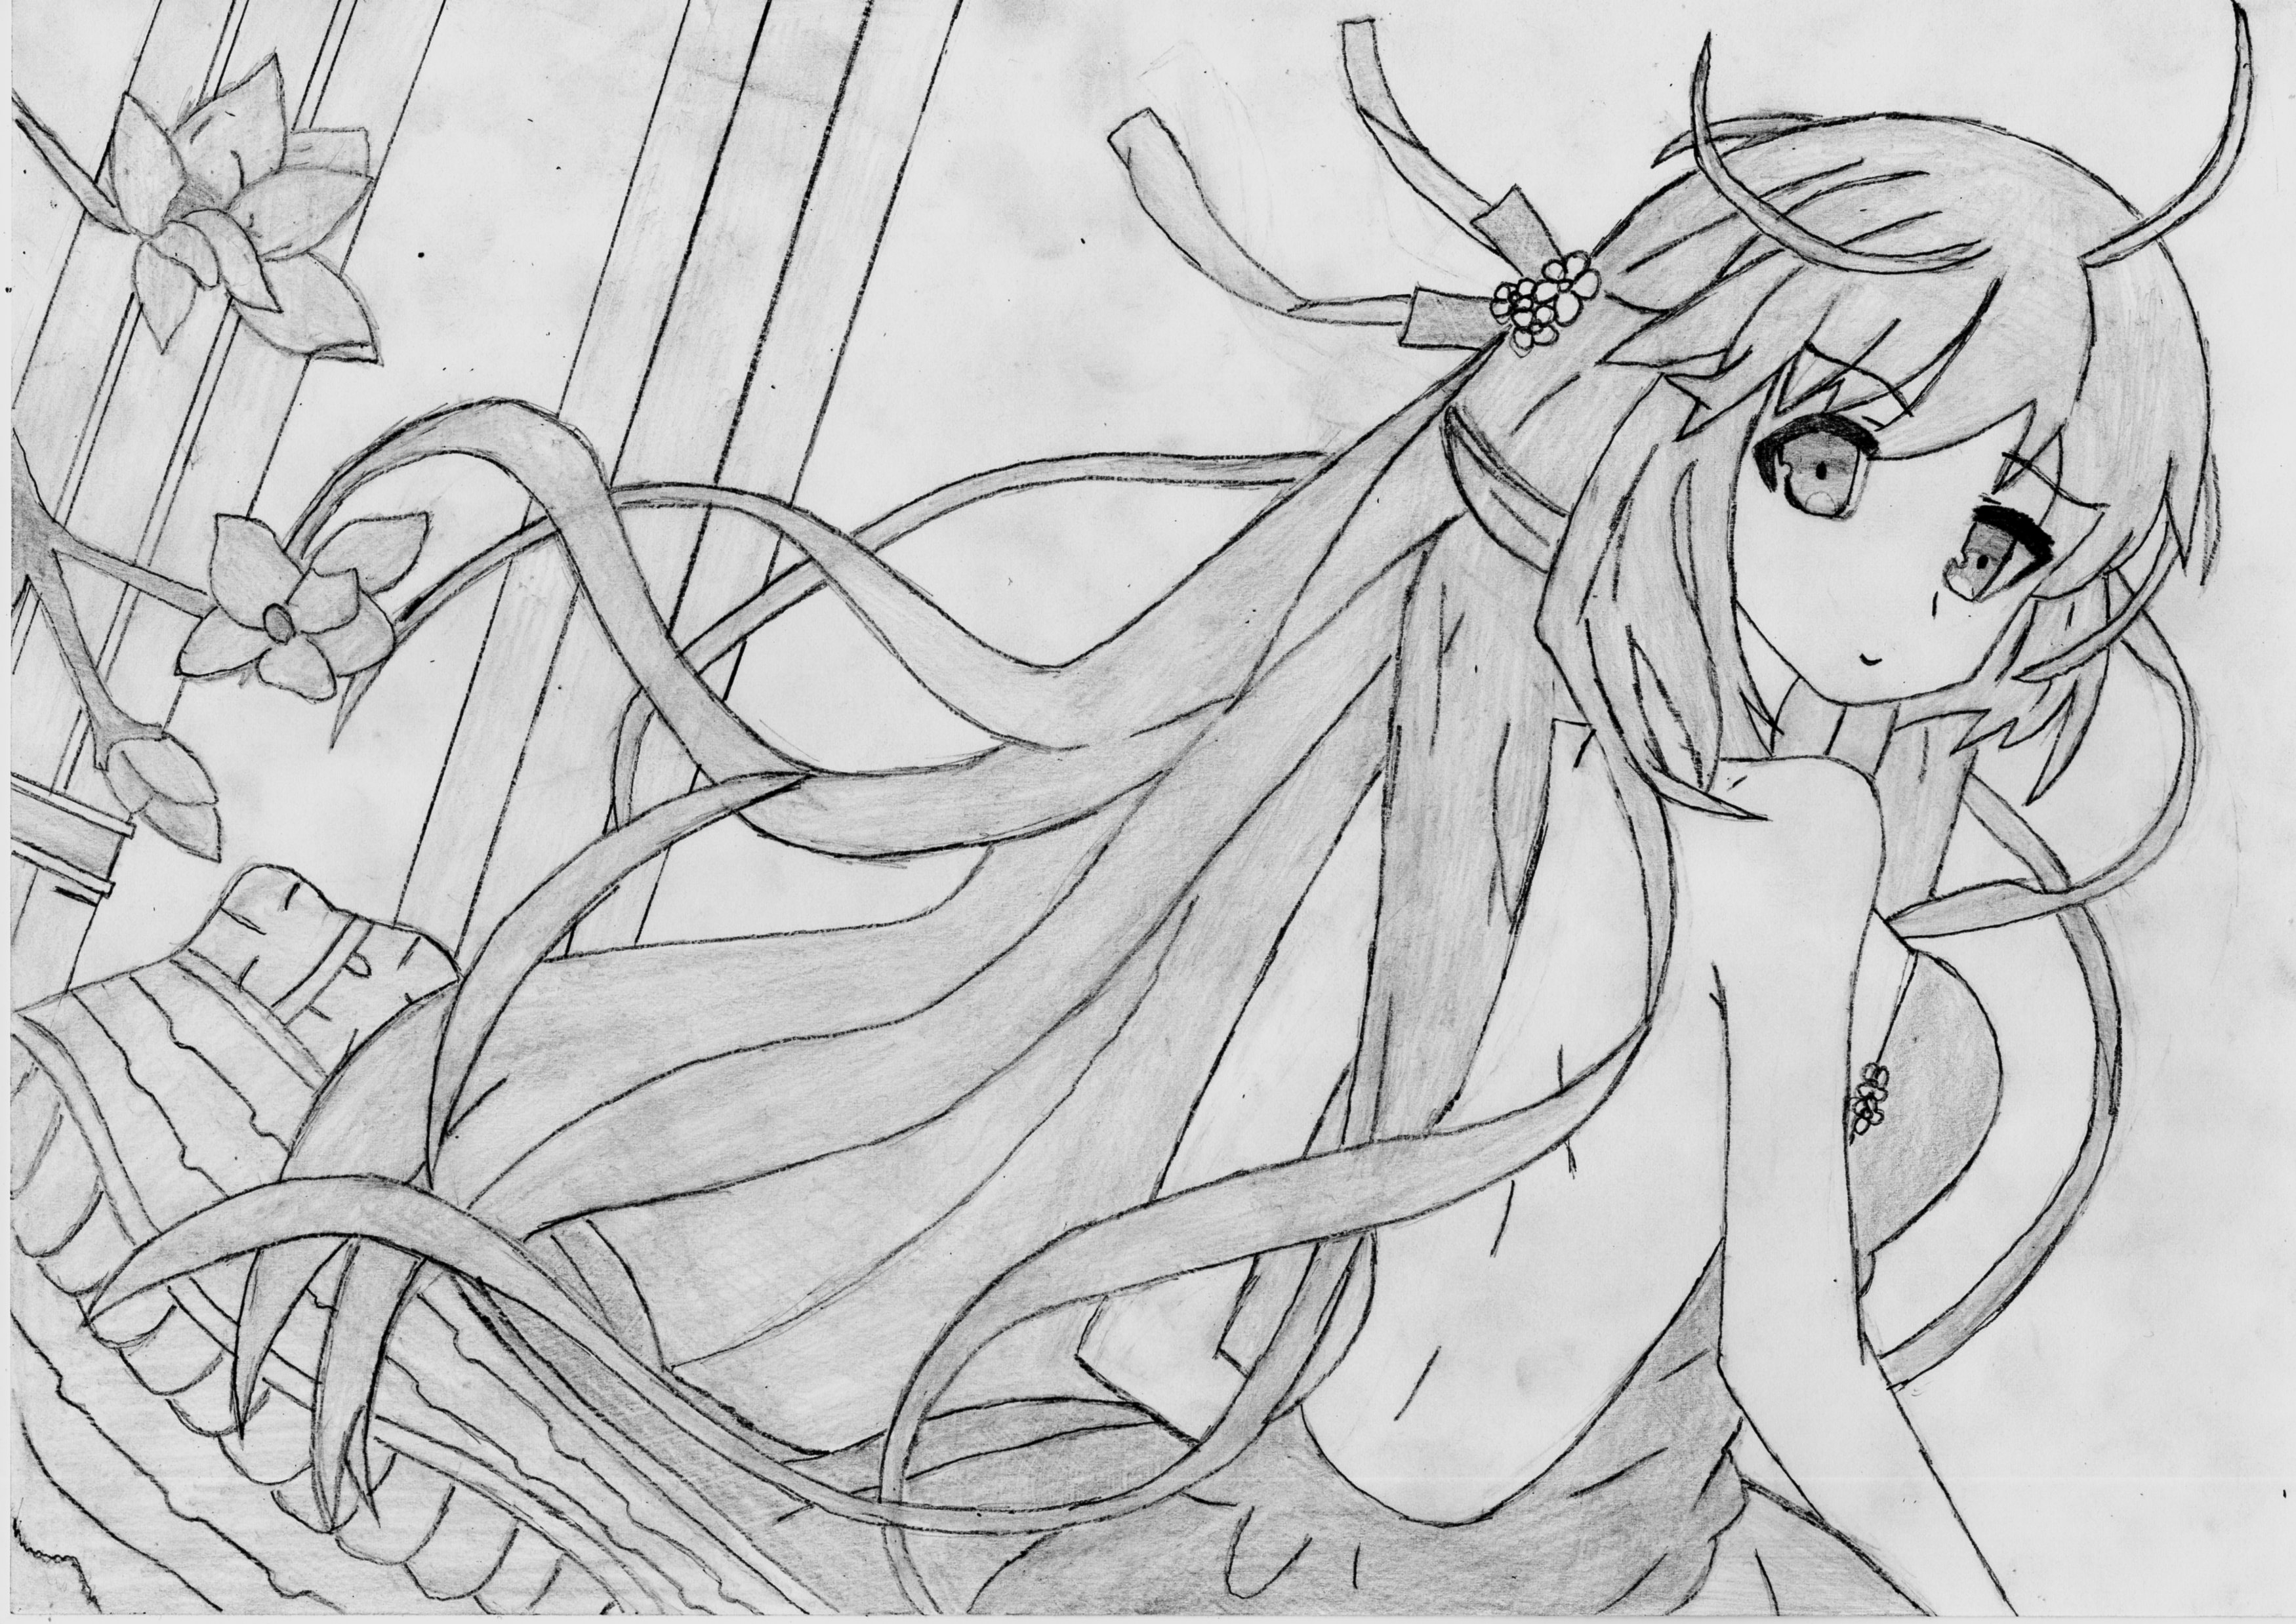 Drawn warrior anime Drawing Anime girl girl drawing